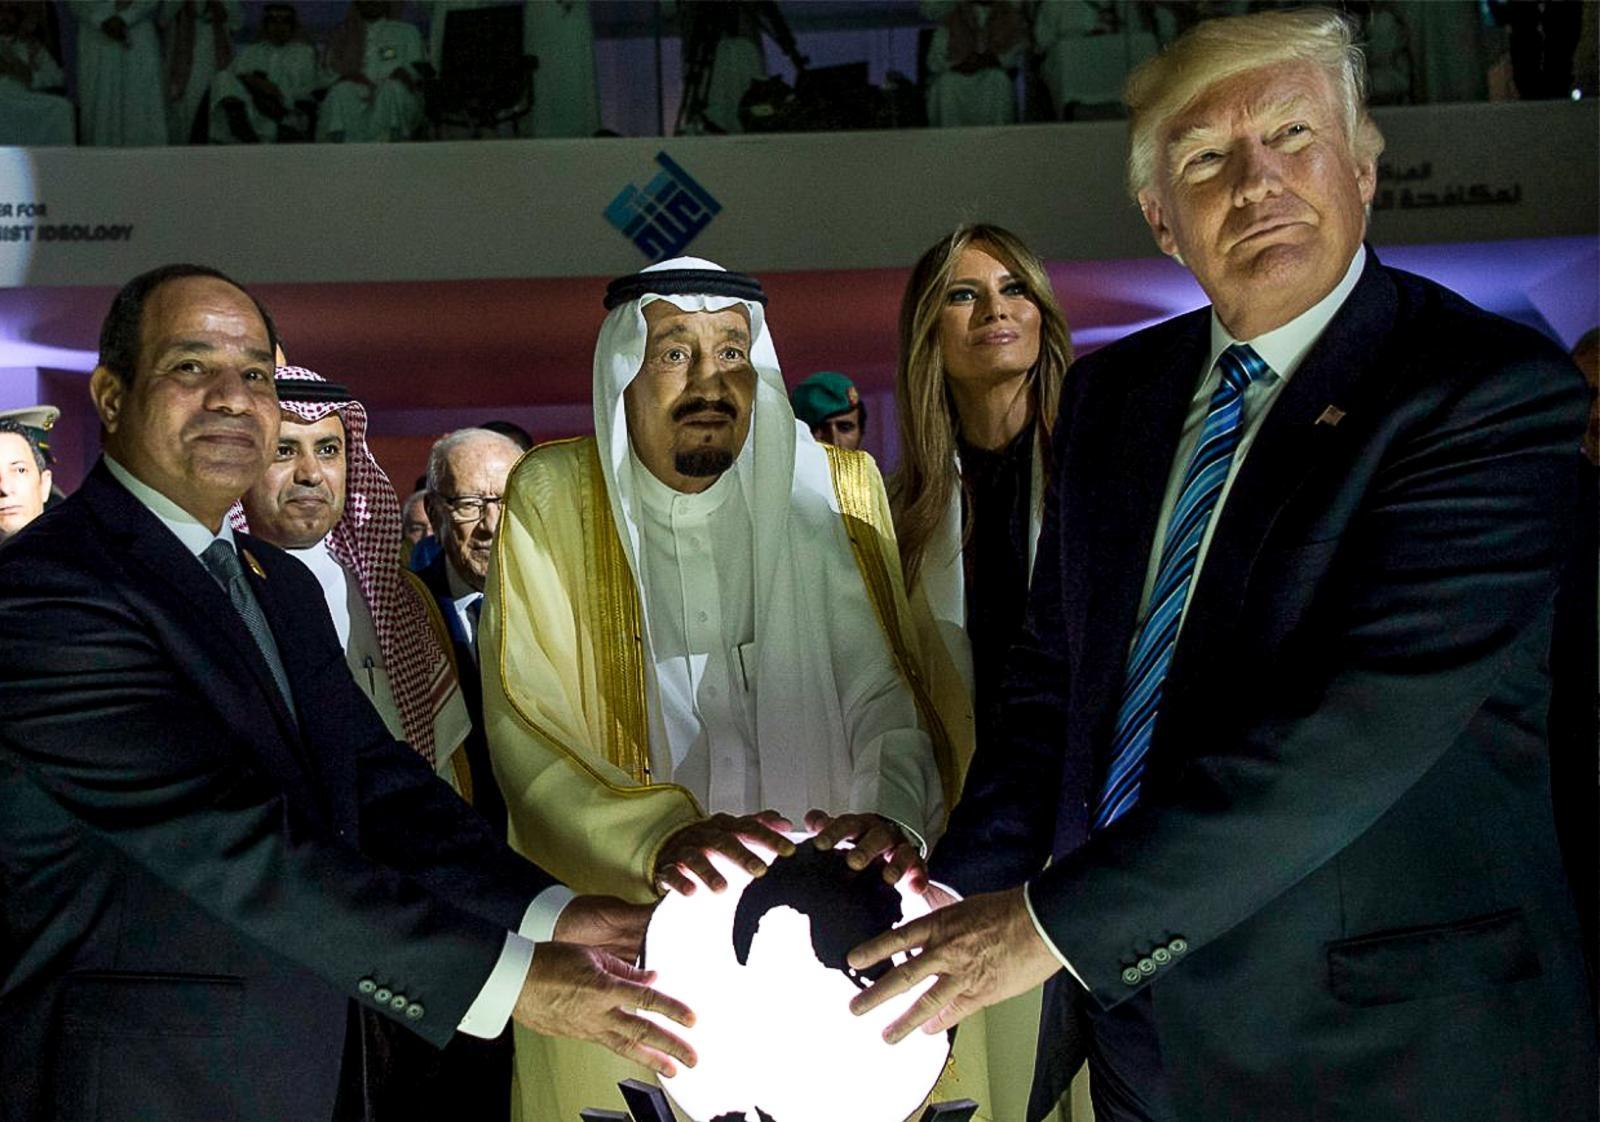 Trump in savdijski kralj Vir:Pixell